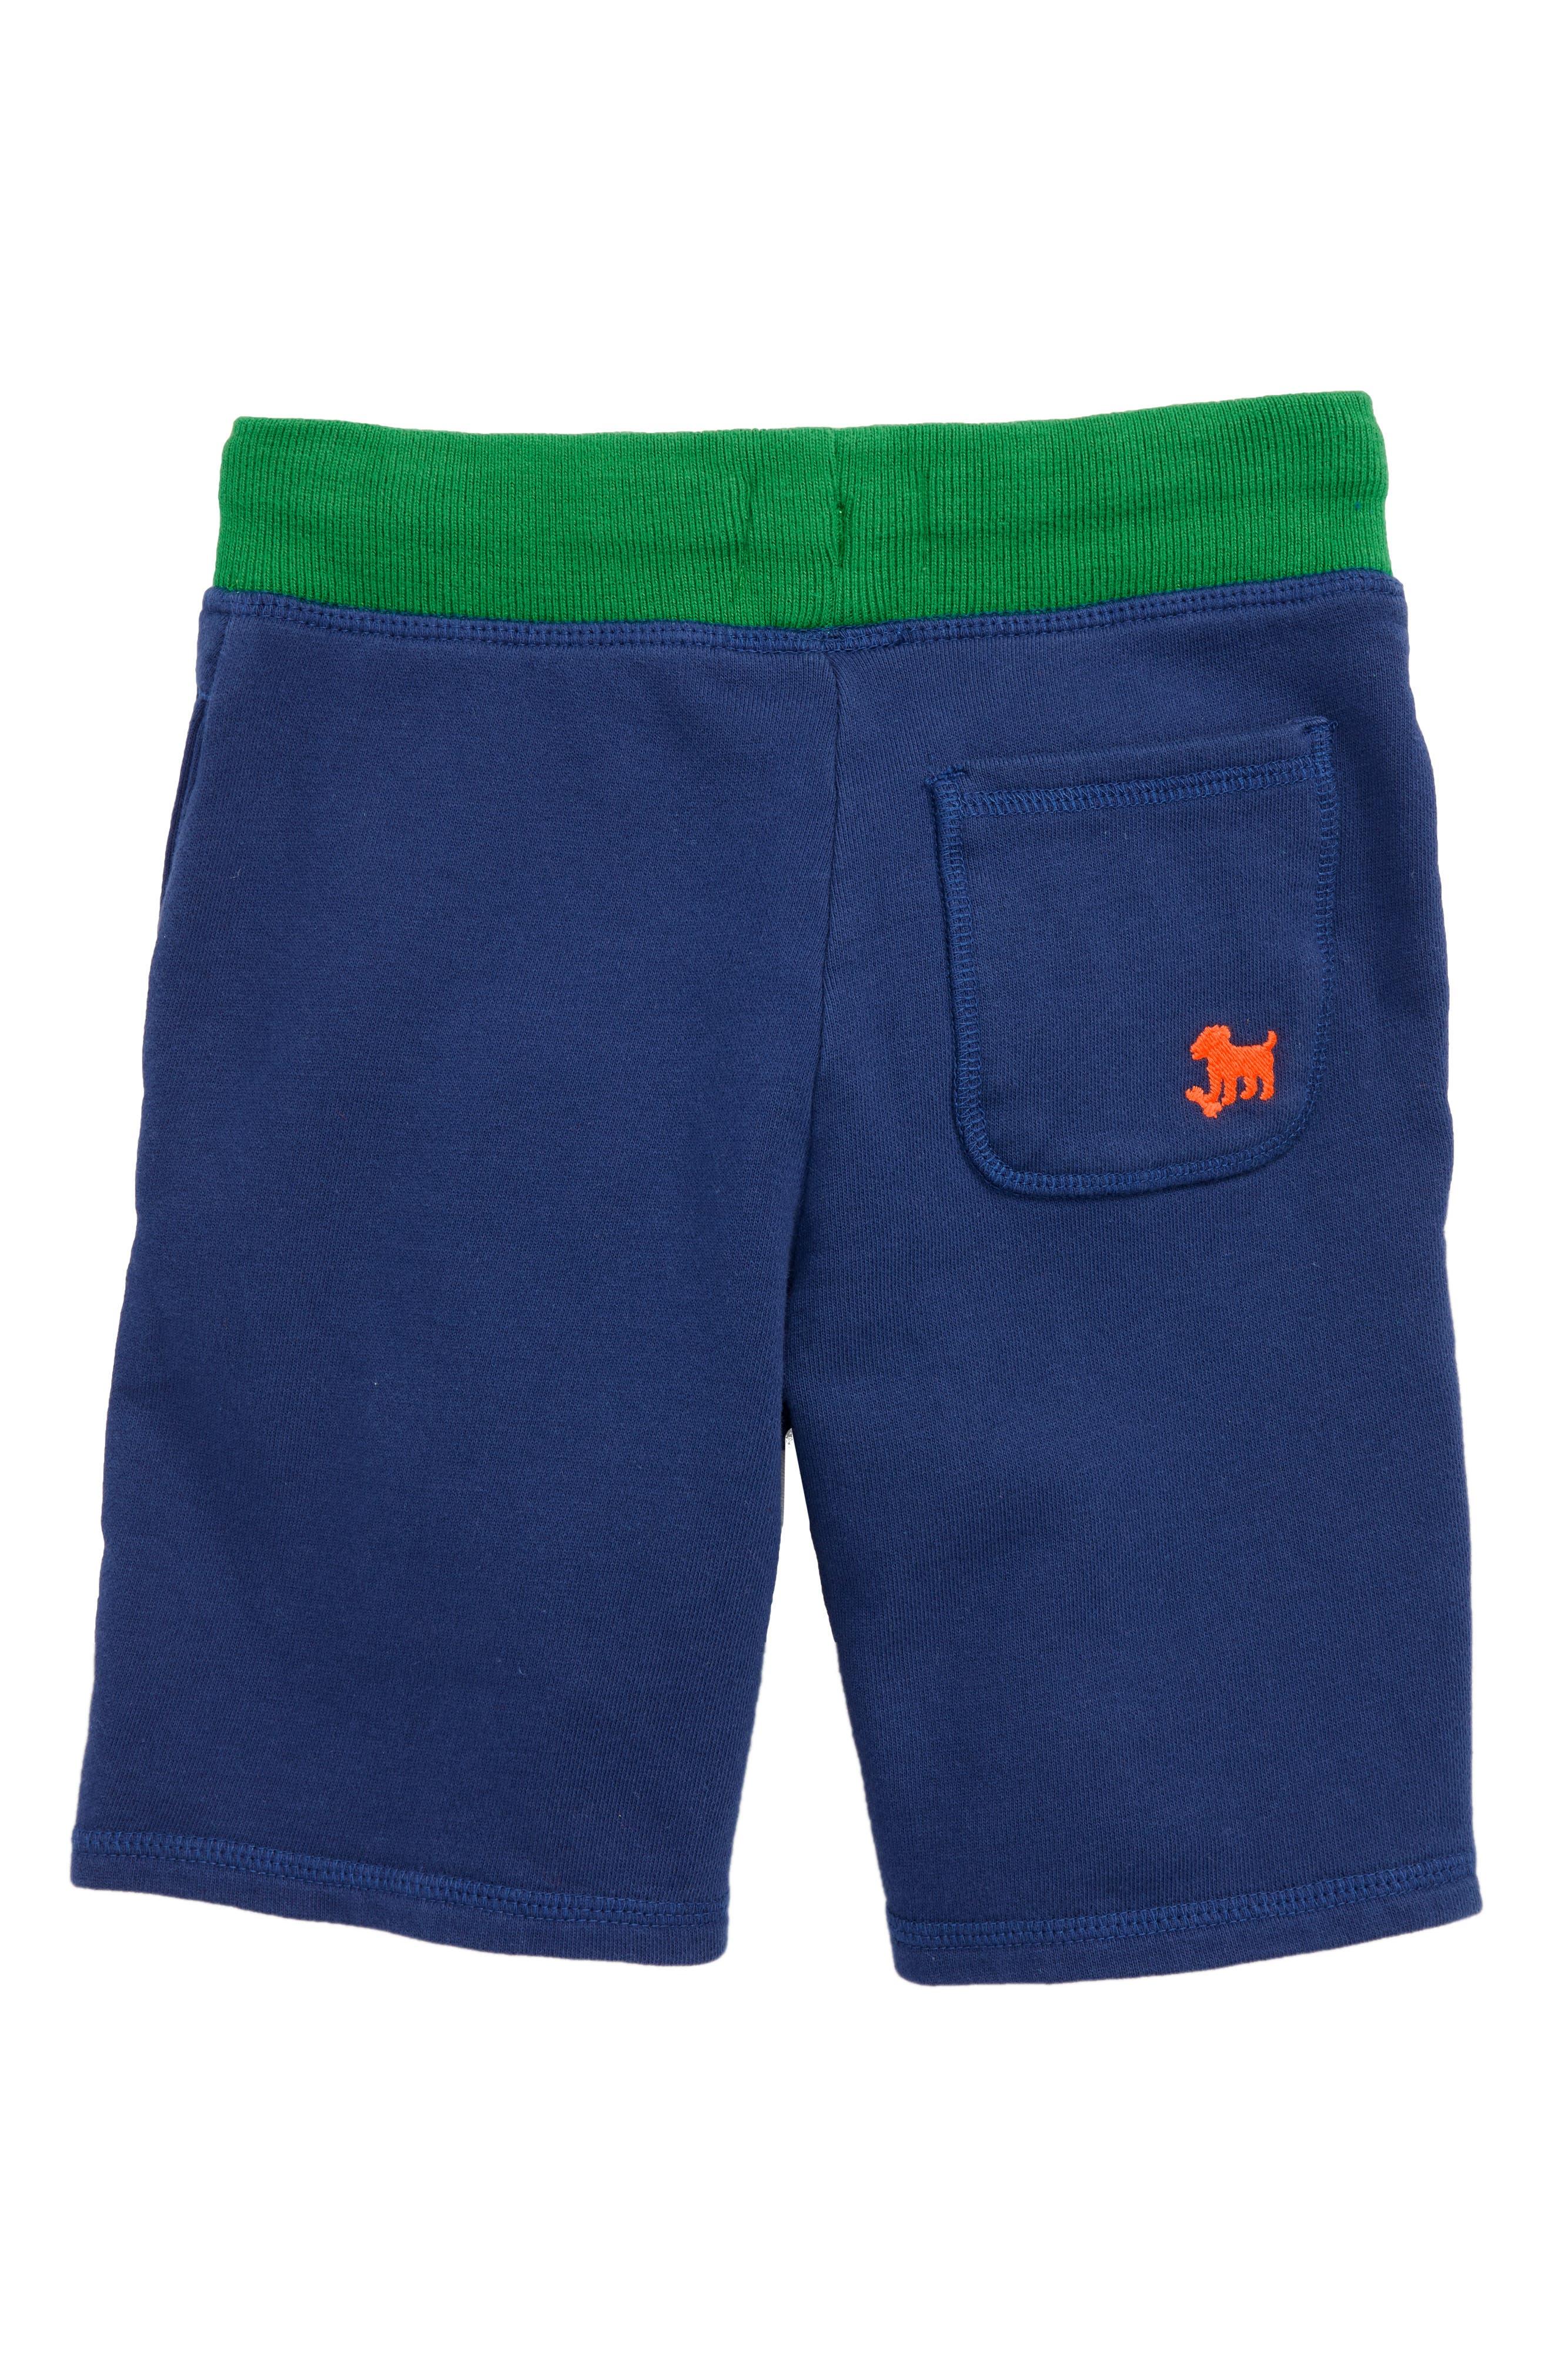 Crocodile Appliqué Sweat Shorts,                             Alternate thumbnail 2, color,                             Beacon Blue Crocodile